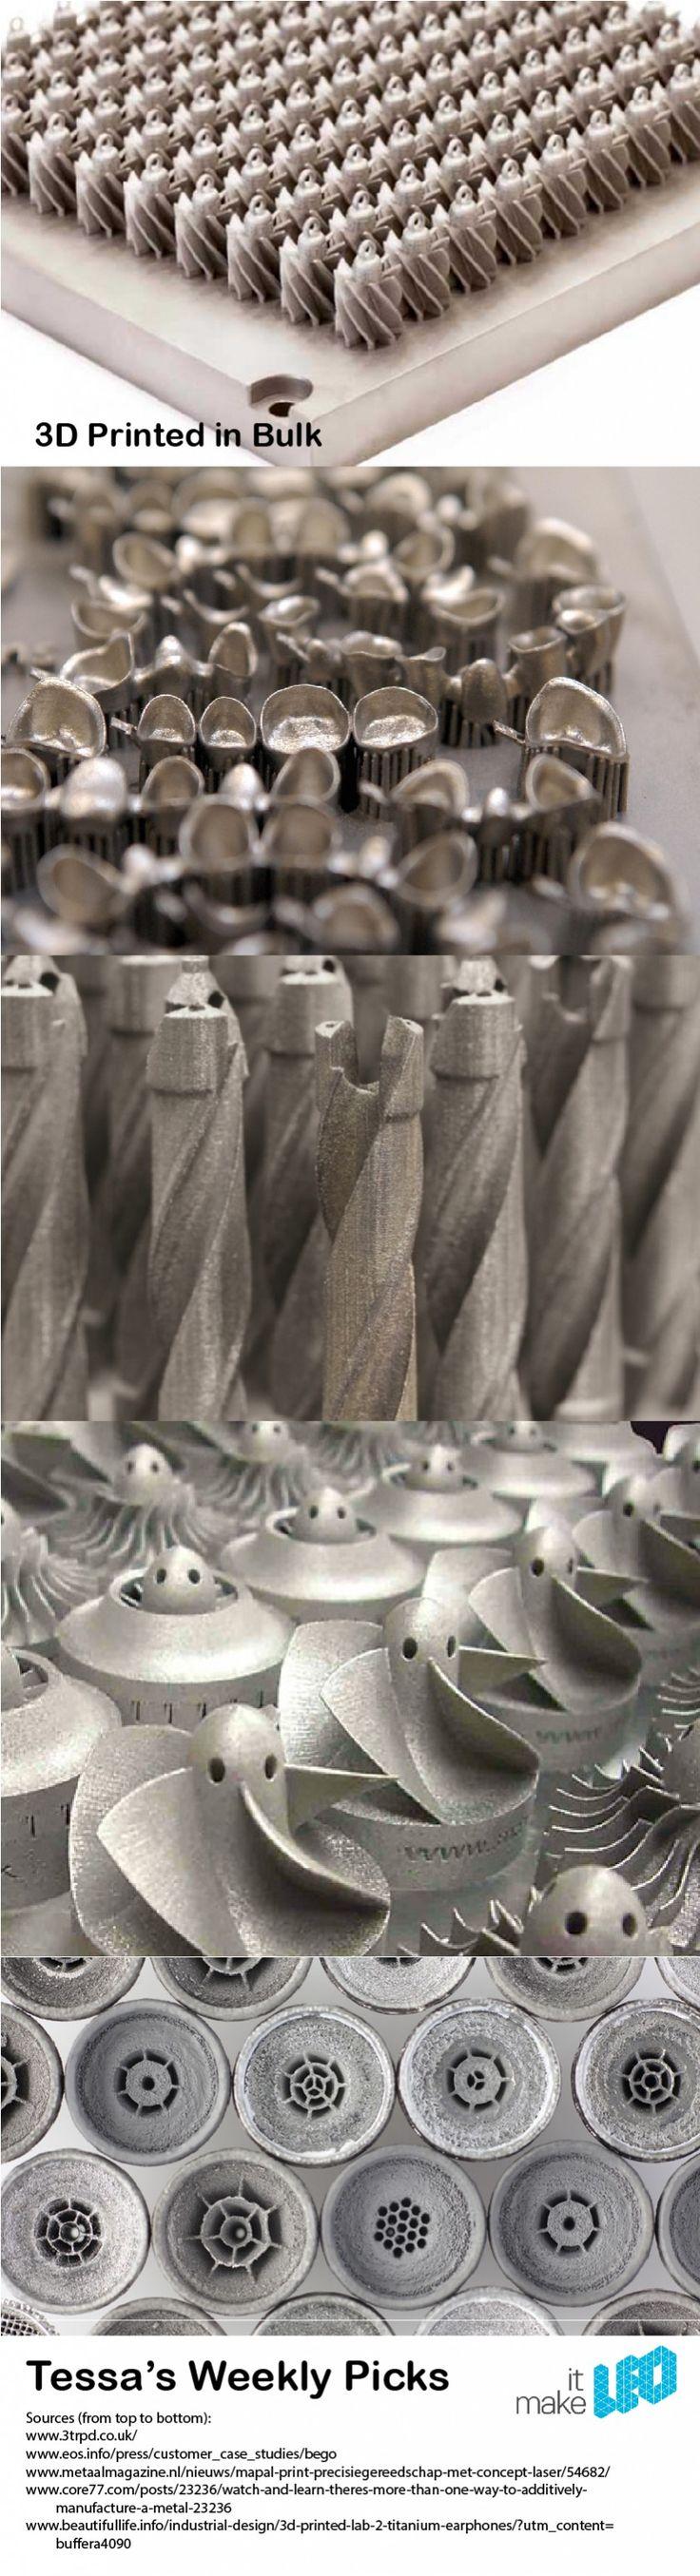 471 best CNC 3D Printing images on Pinterest